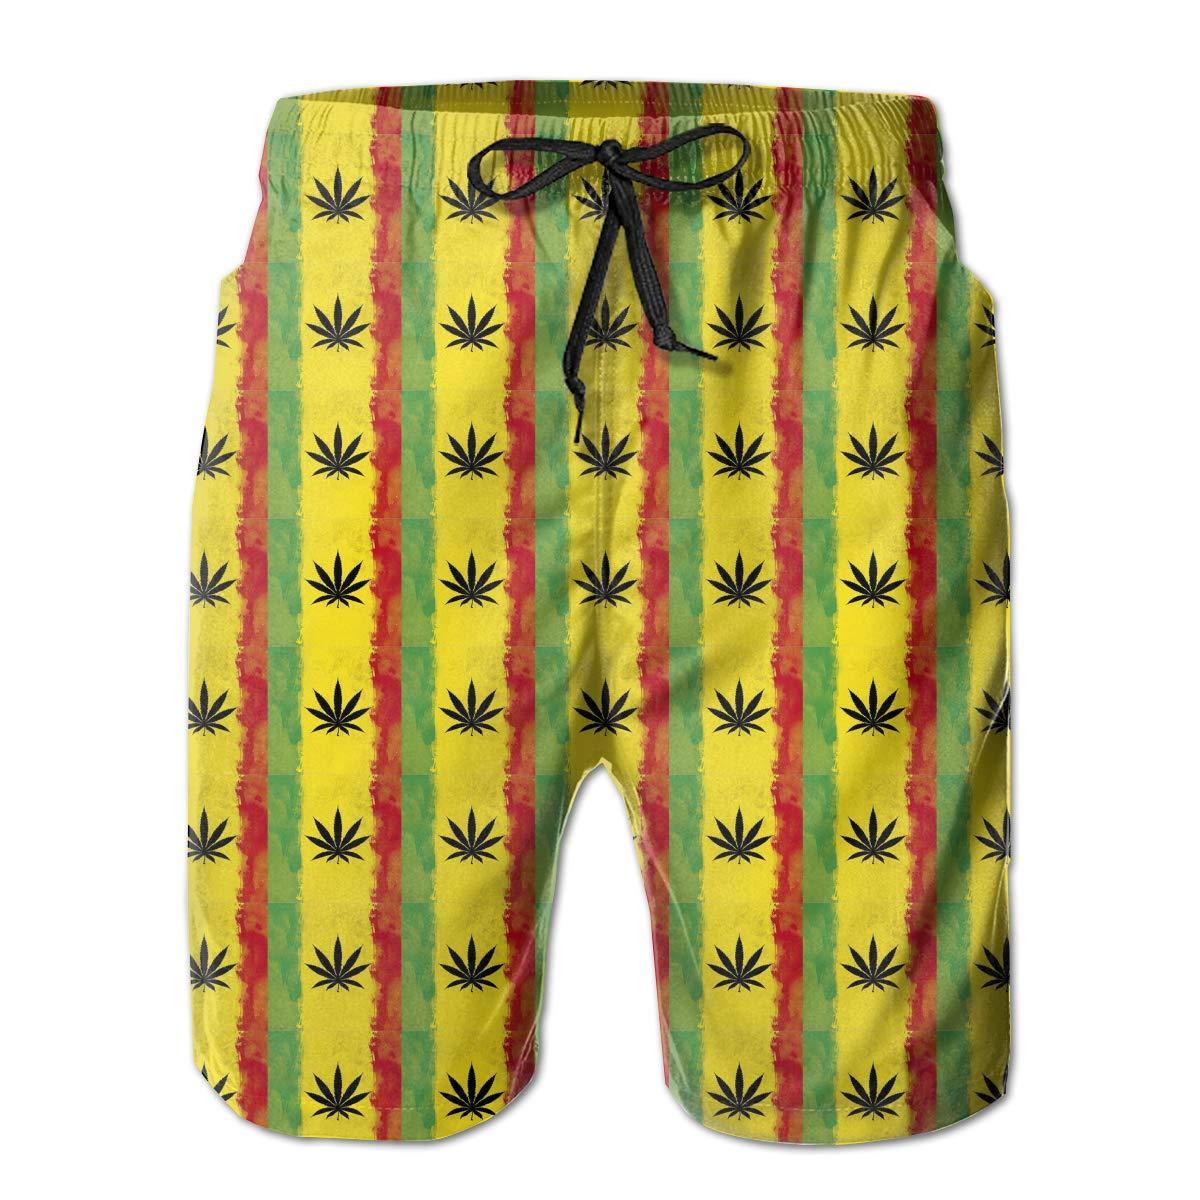 RolandraceWeed Reggae Mens Colorful Swim Trunks Beach Board Shorts with Lining